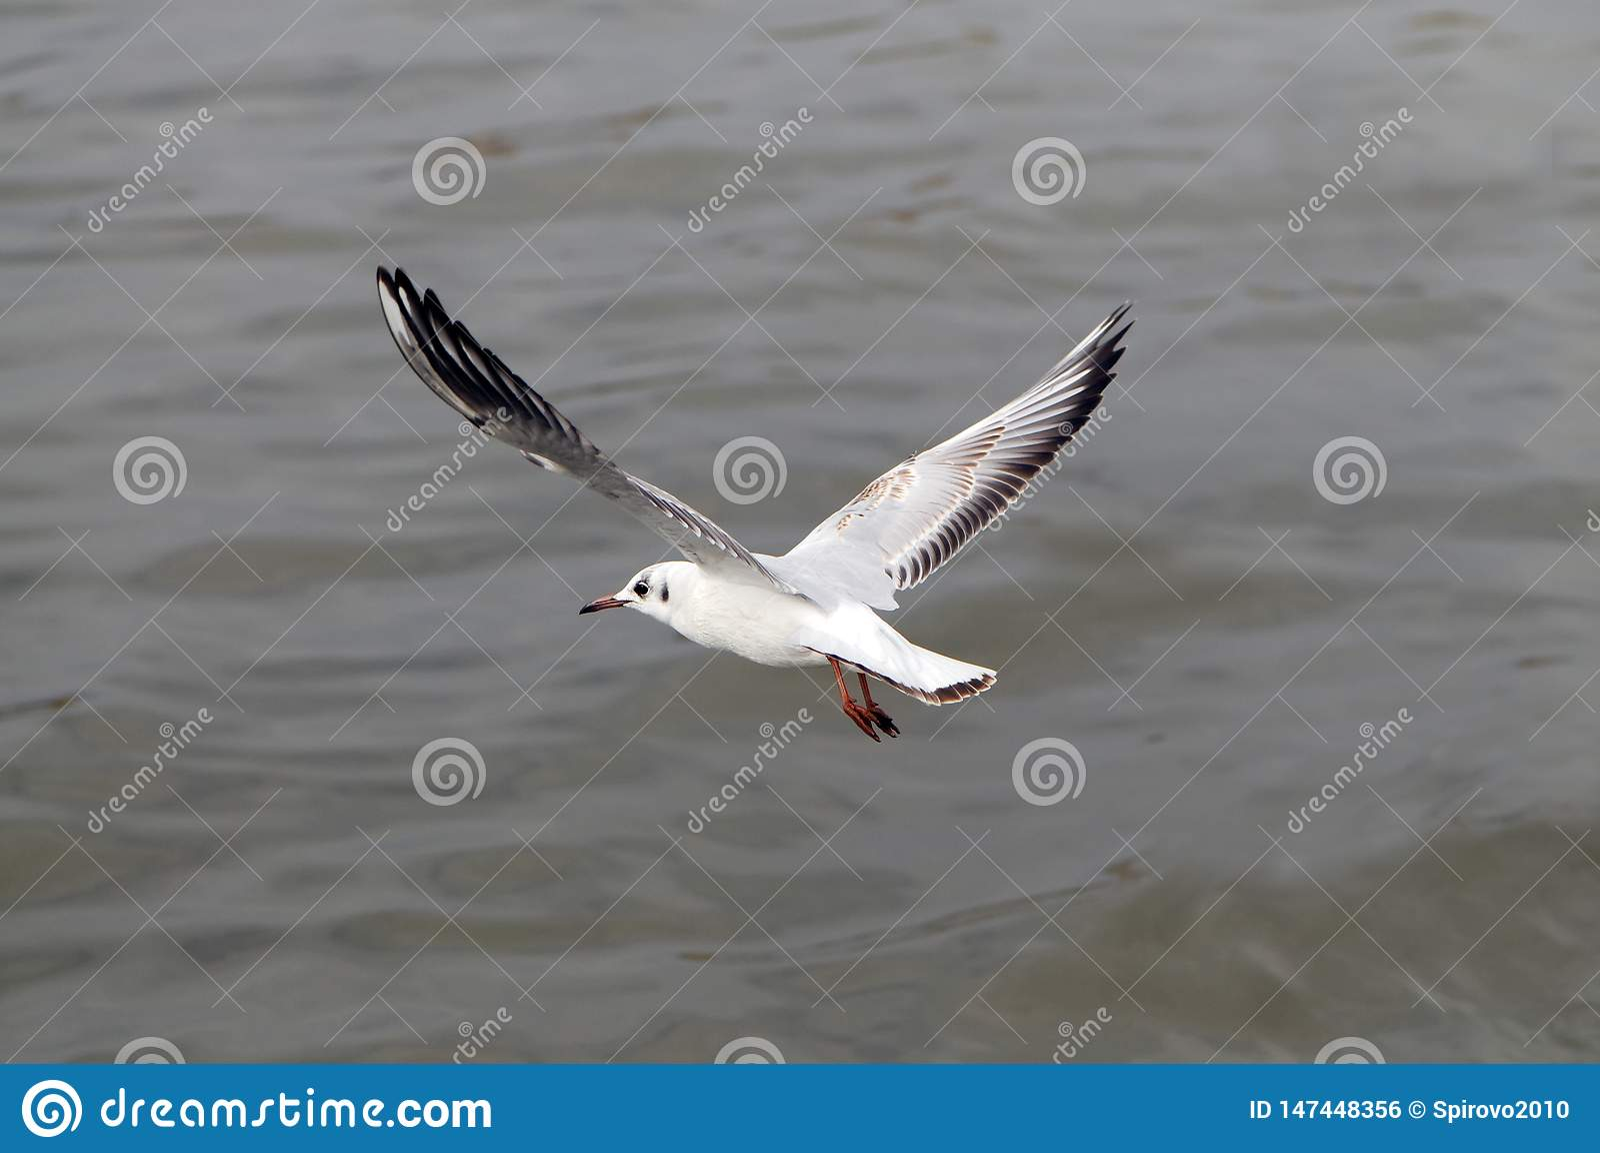 Seagull hover over deep blue sea.